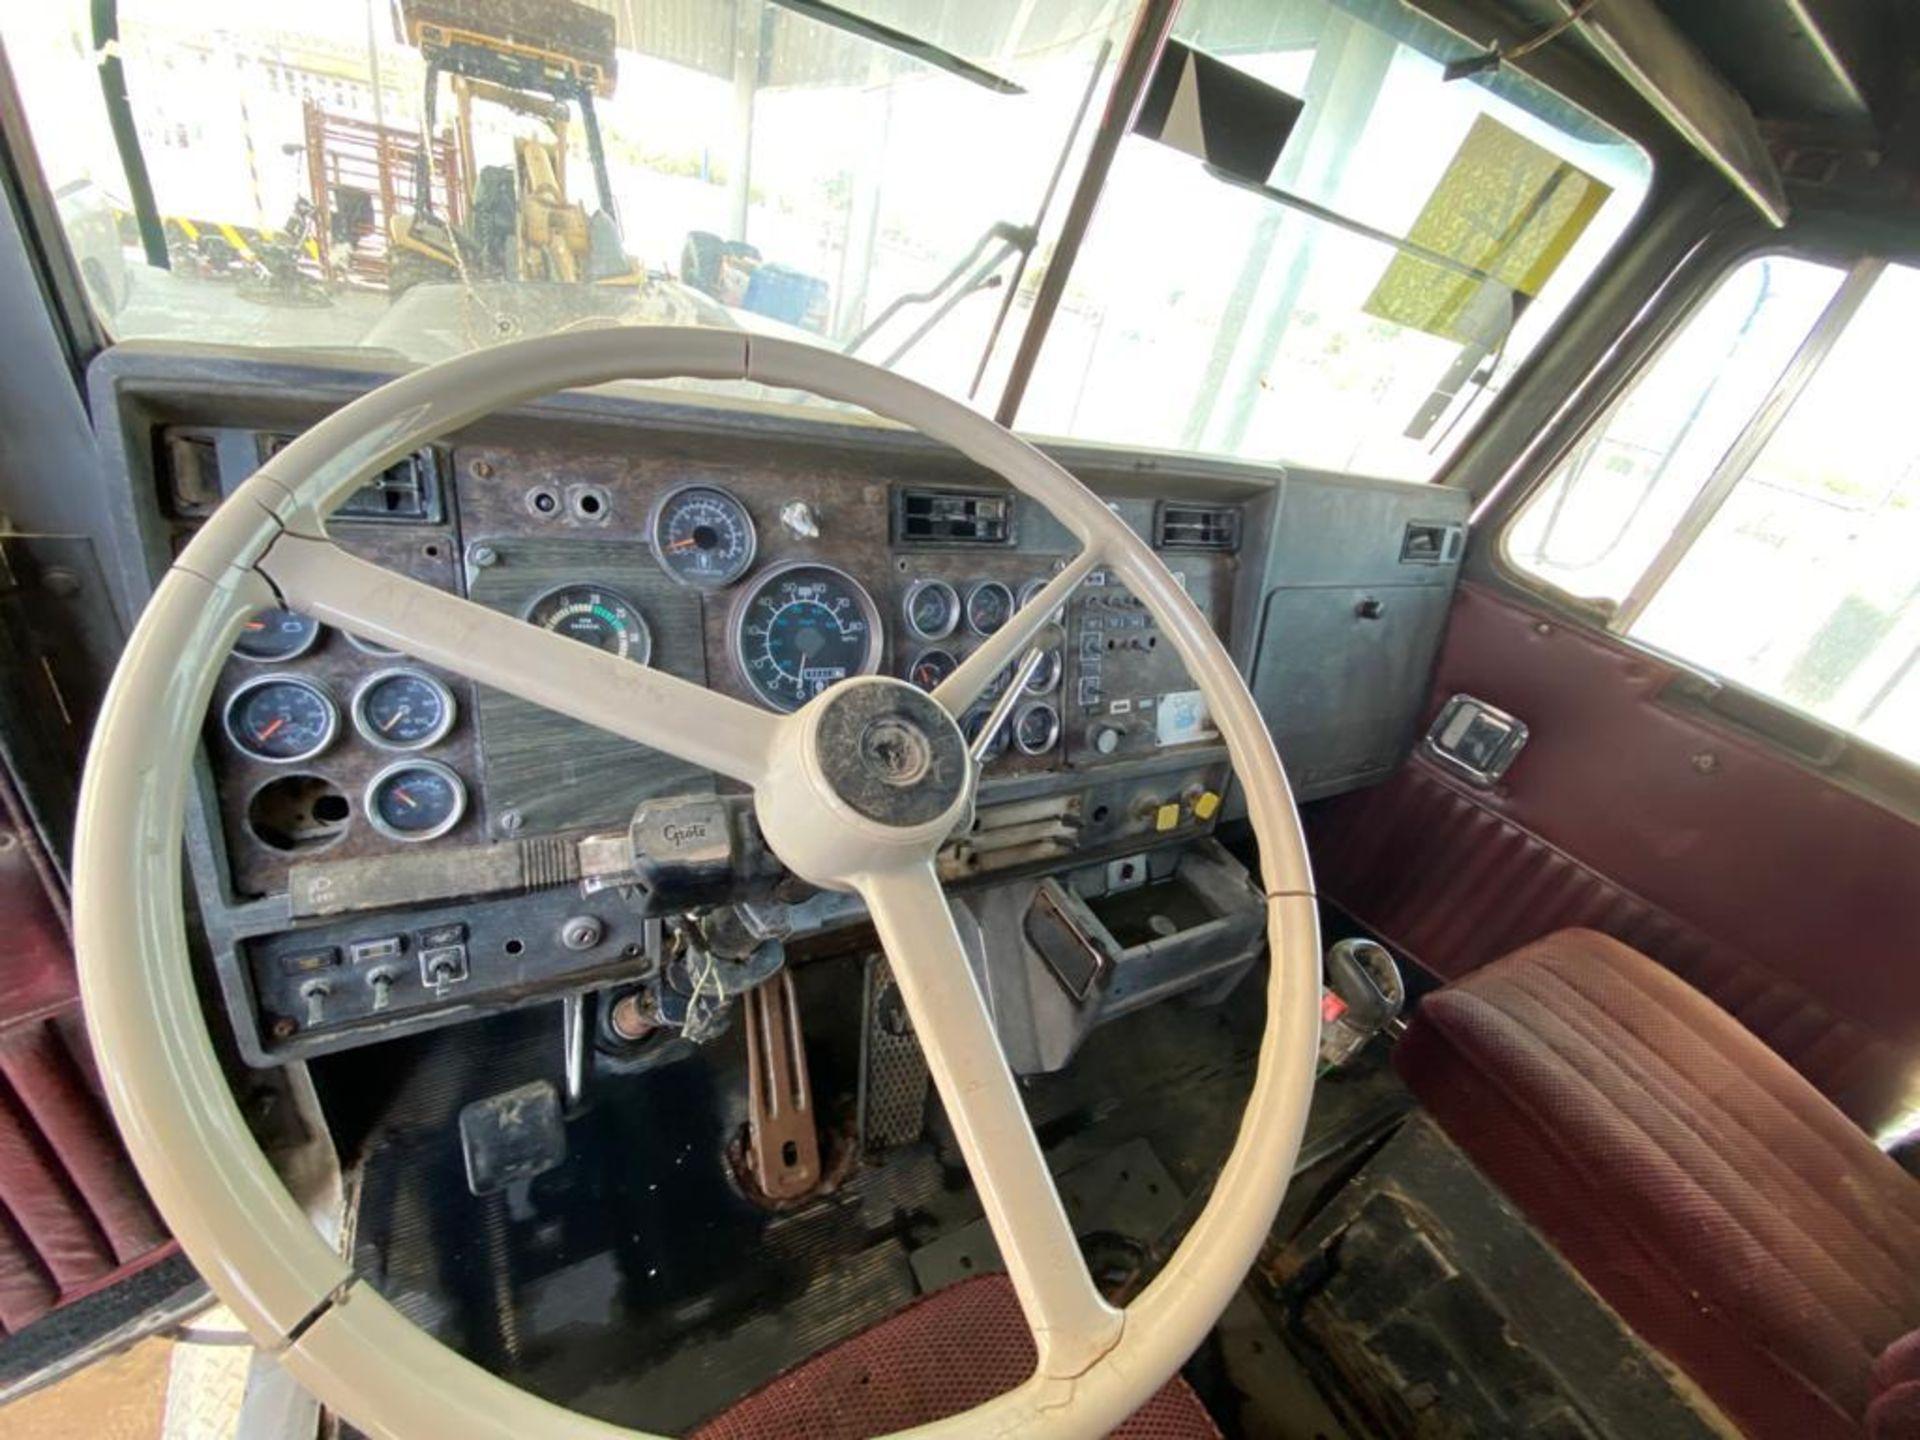 1983 Kenworth Dump Truck, standard transmission of 10 speeds, with Cummins motor - Image 29 of 68